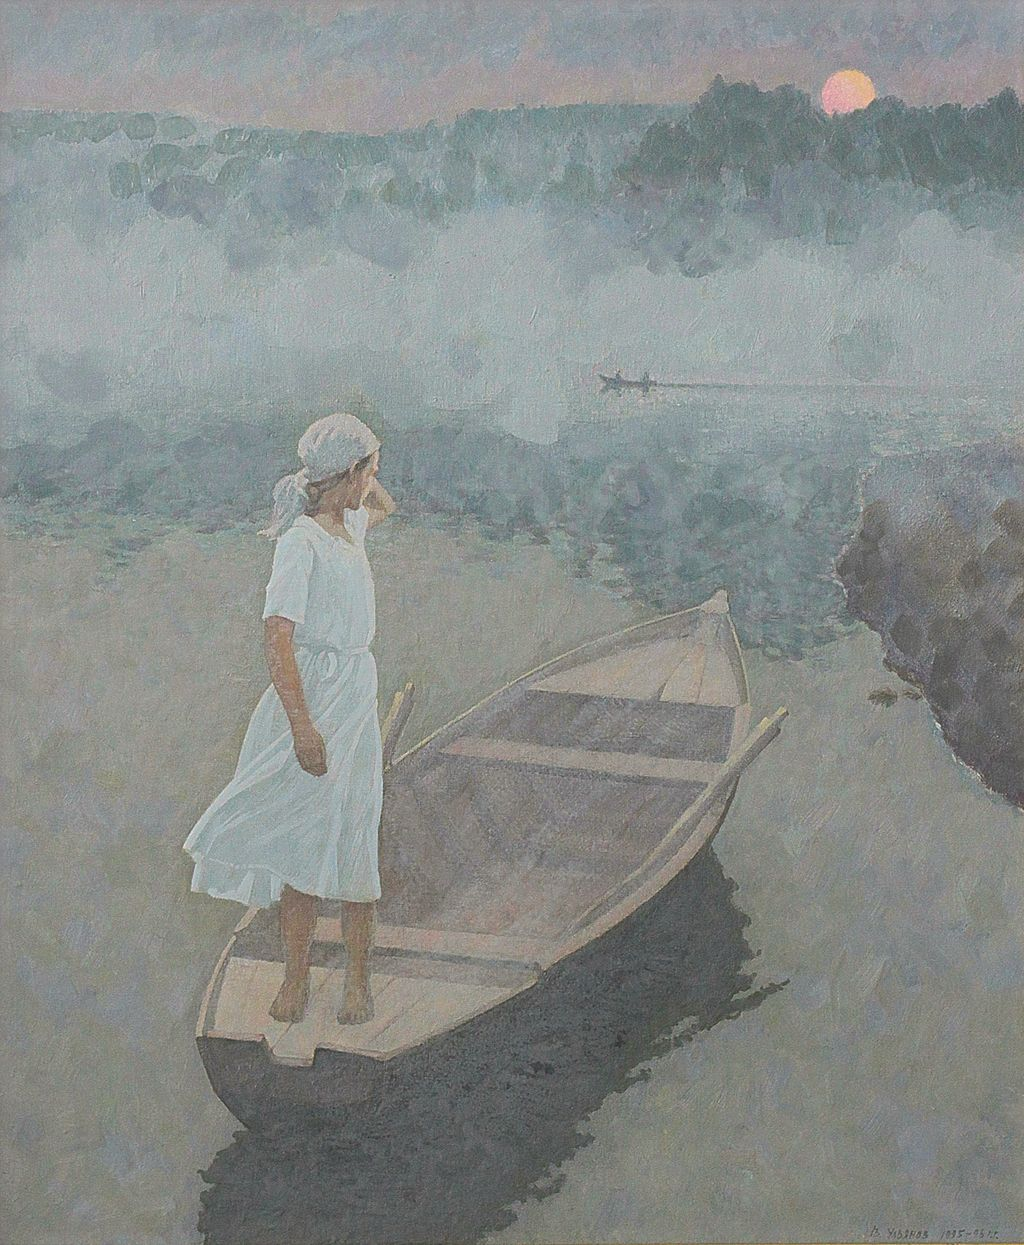 В.А.Ульянов. Утро на Волге. 1995-1998. 80х60 см., холст, масло.